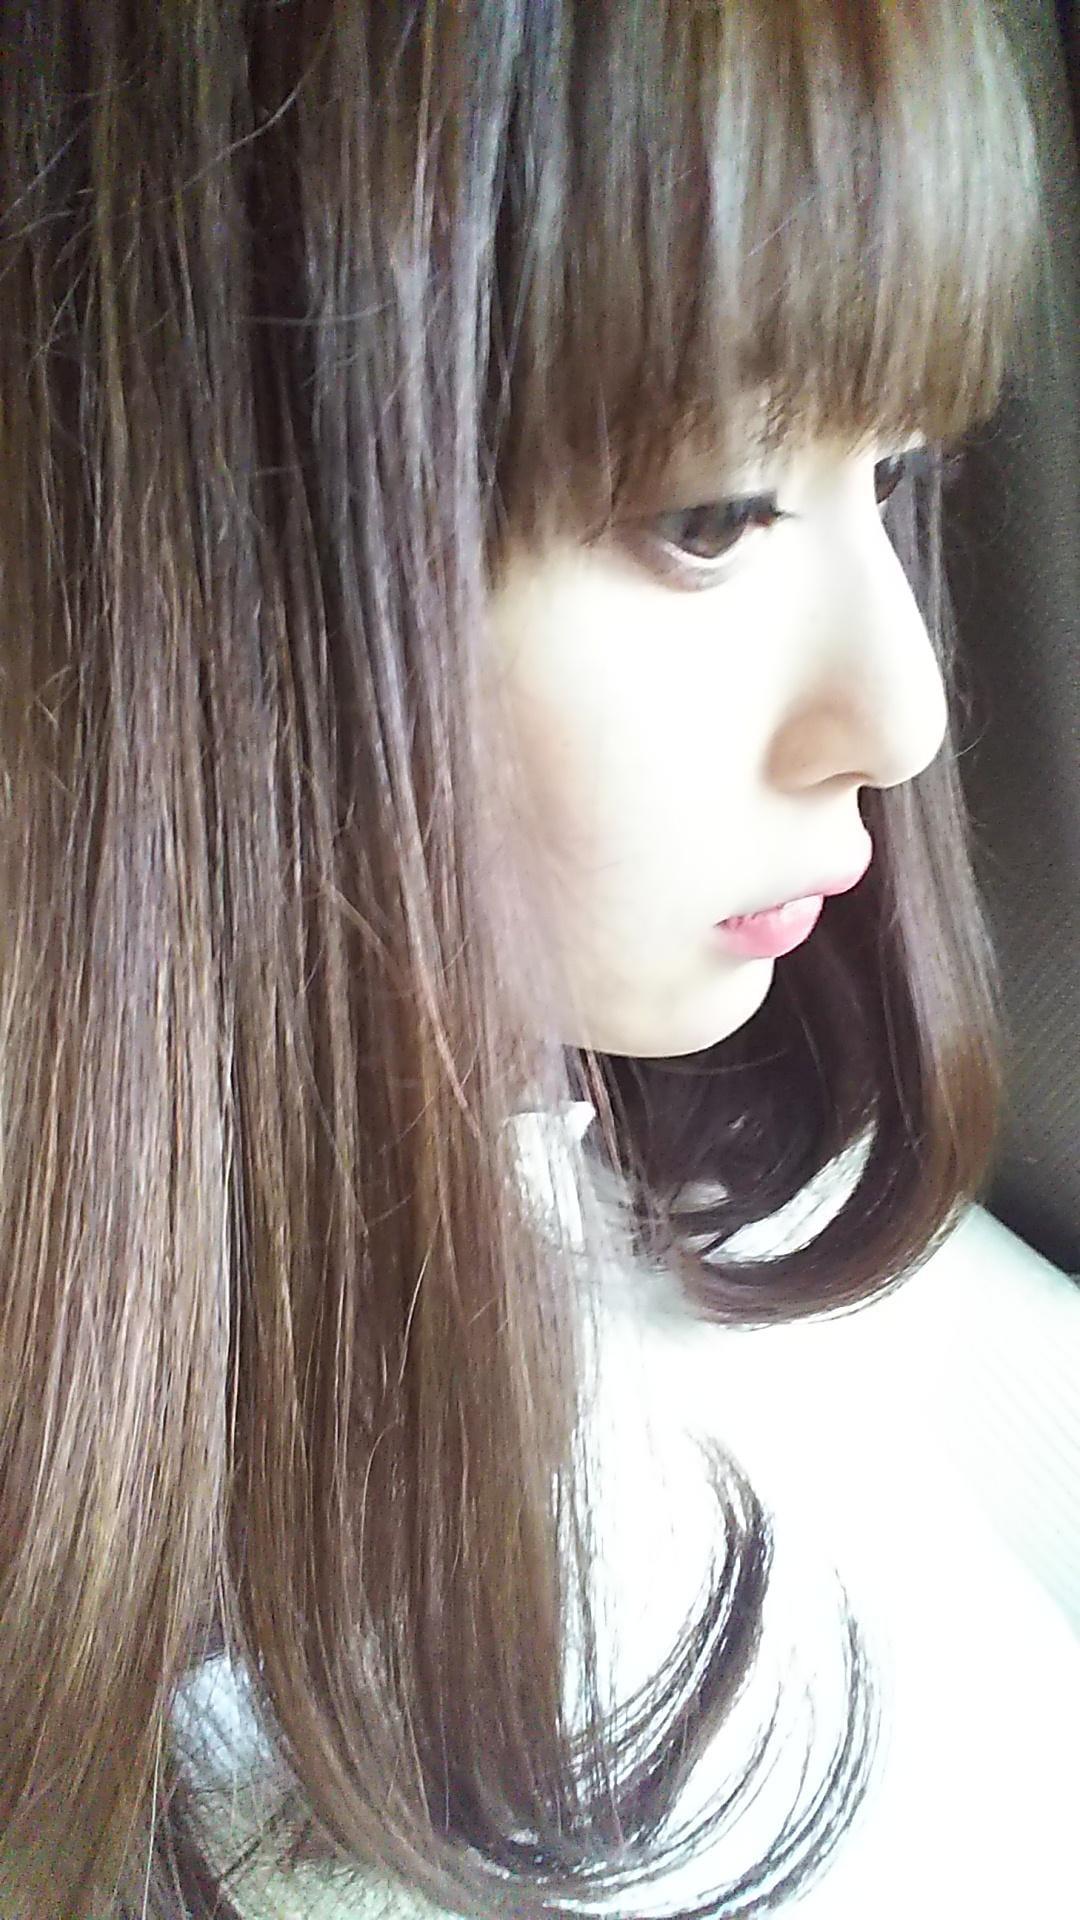 RINA【りな】「うに〜」05/19(土) 21:20 | RINA【りな】の写メ・風俗動画